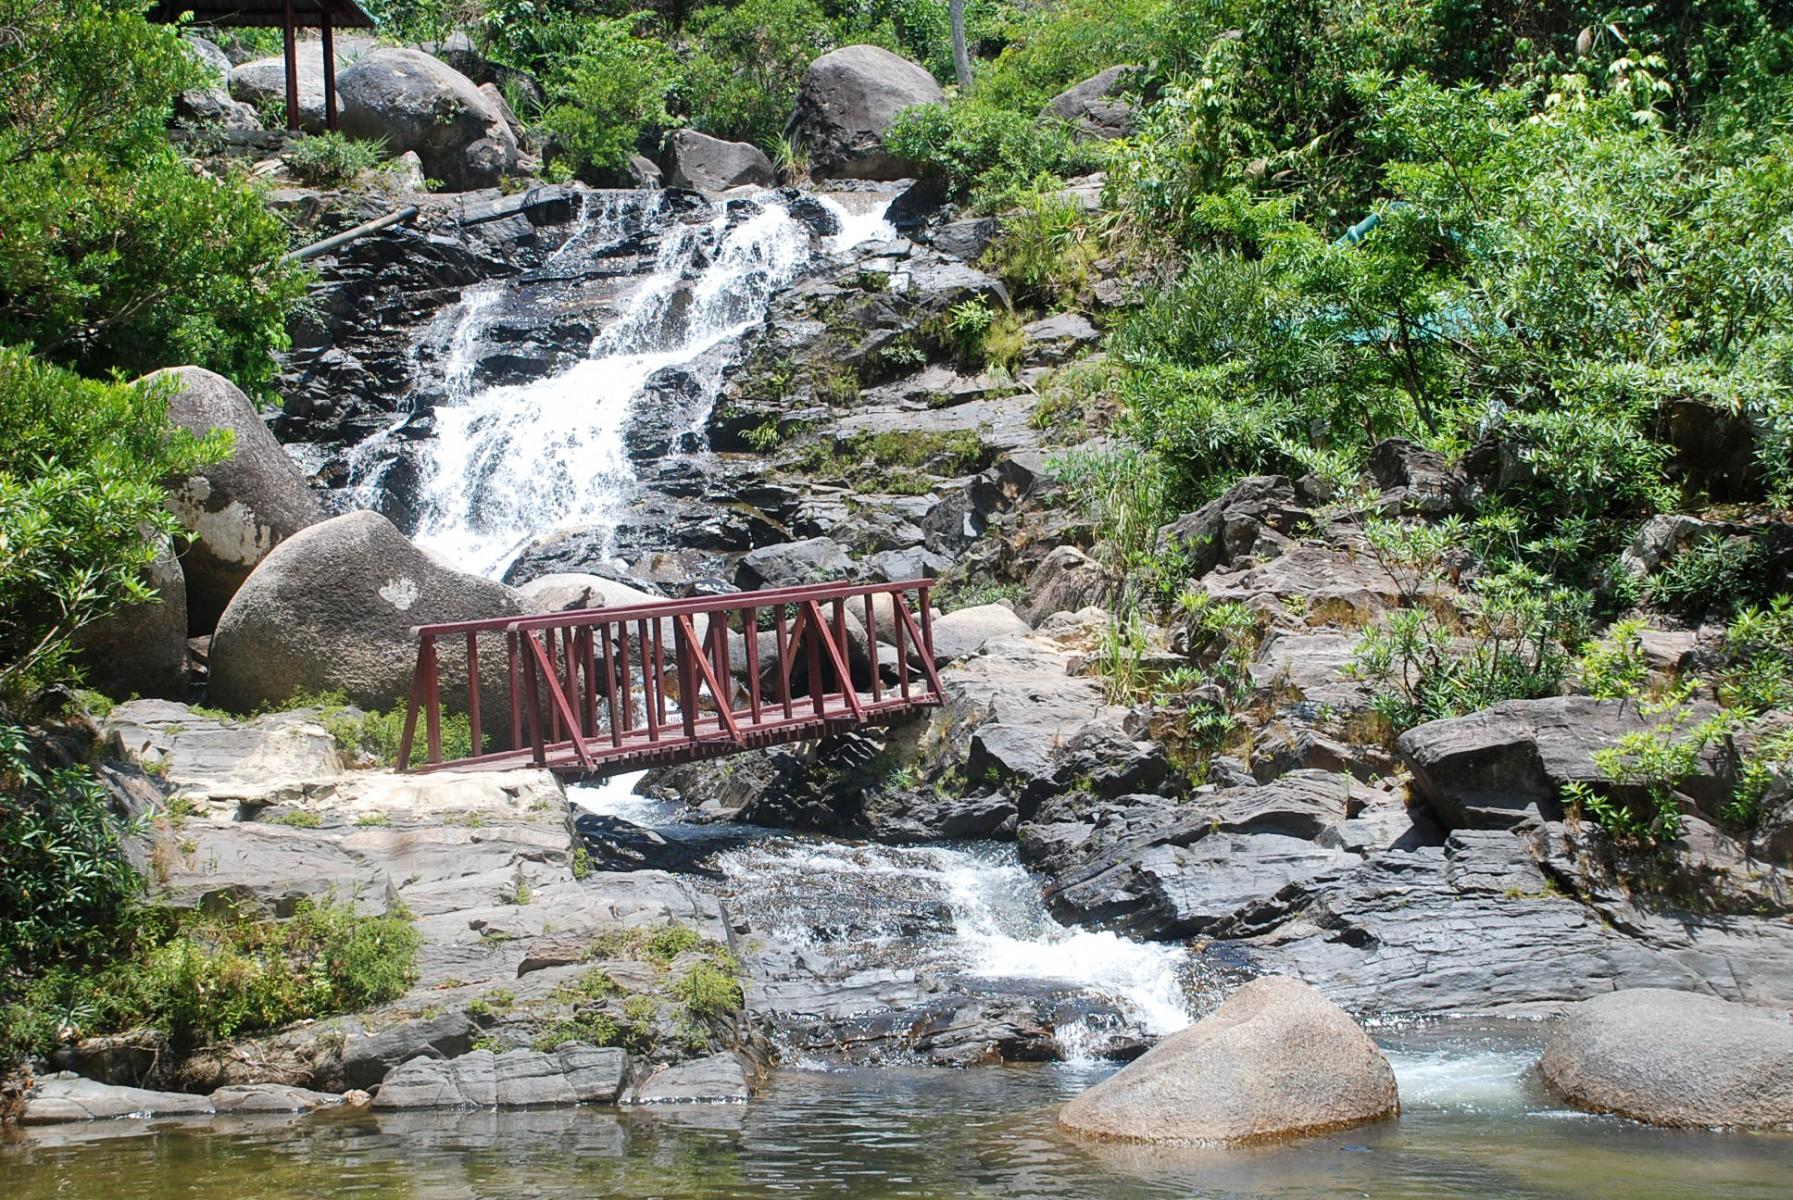 ngam-doi-danang-streams-and-lakes